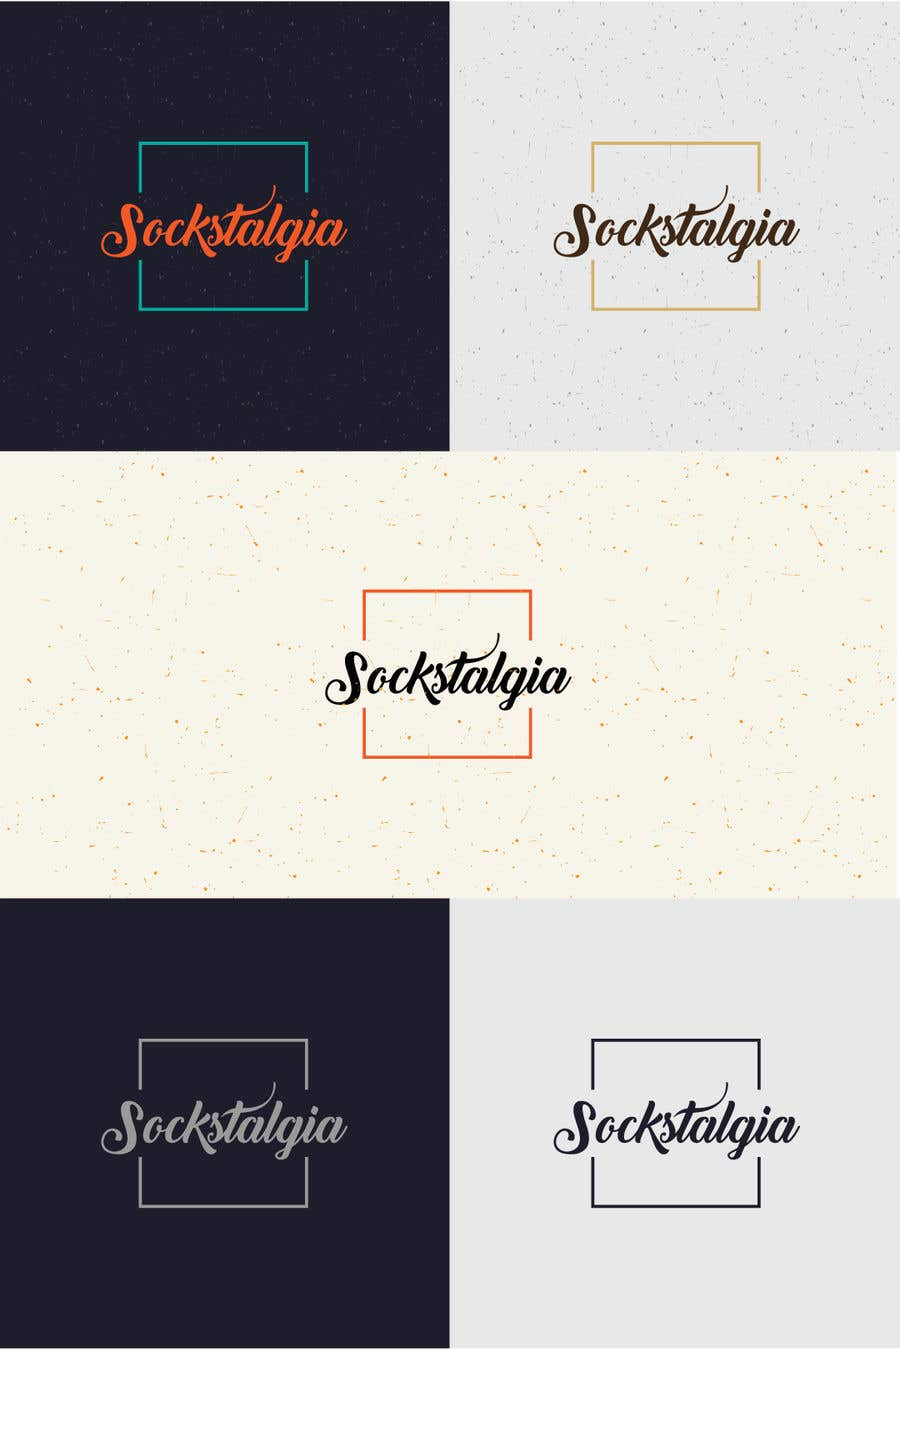 Kilpailutyö #139 kilpailussa Design project